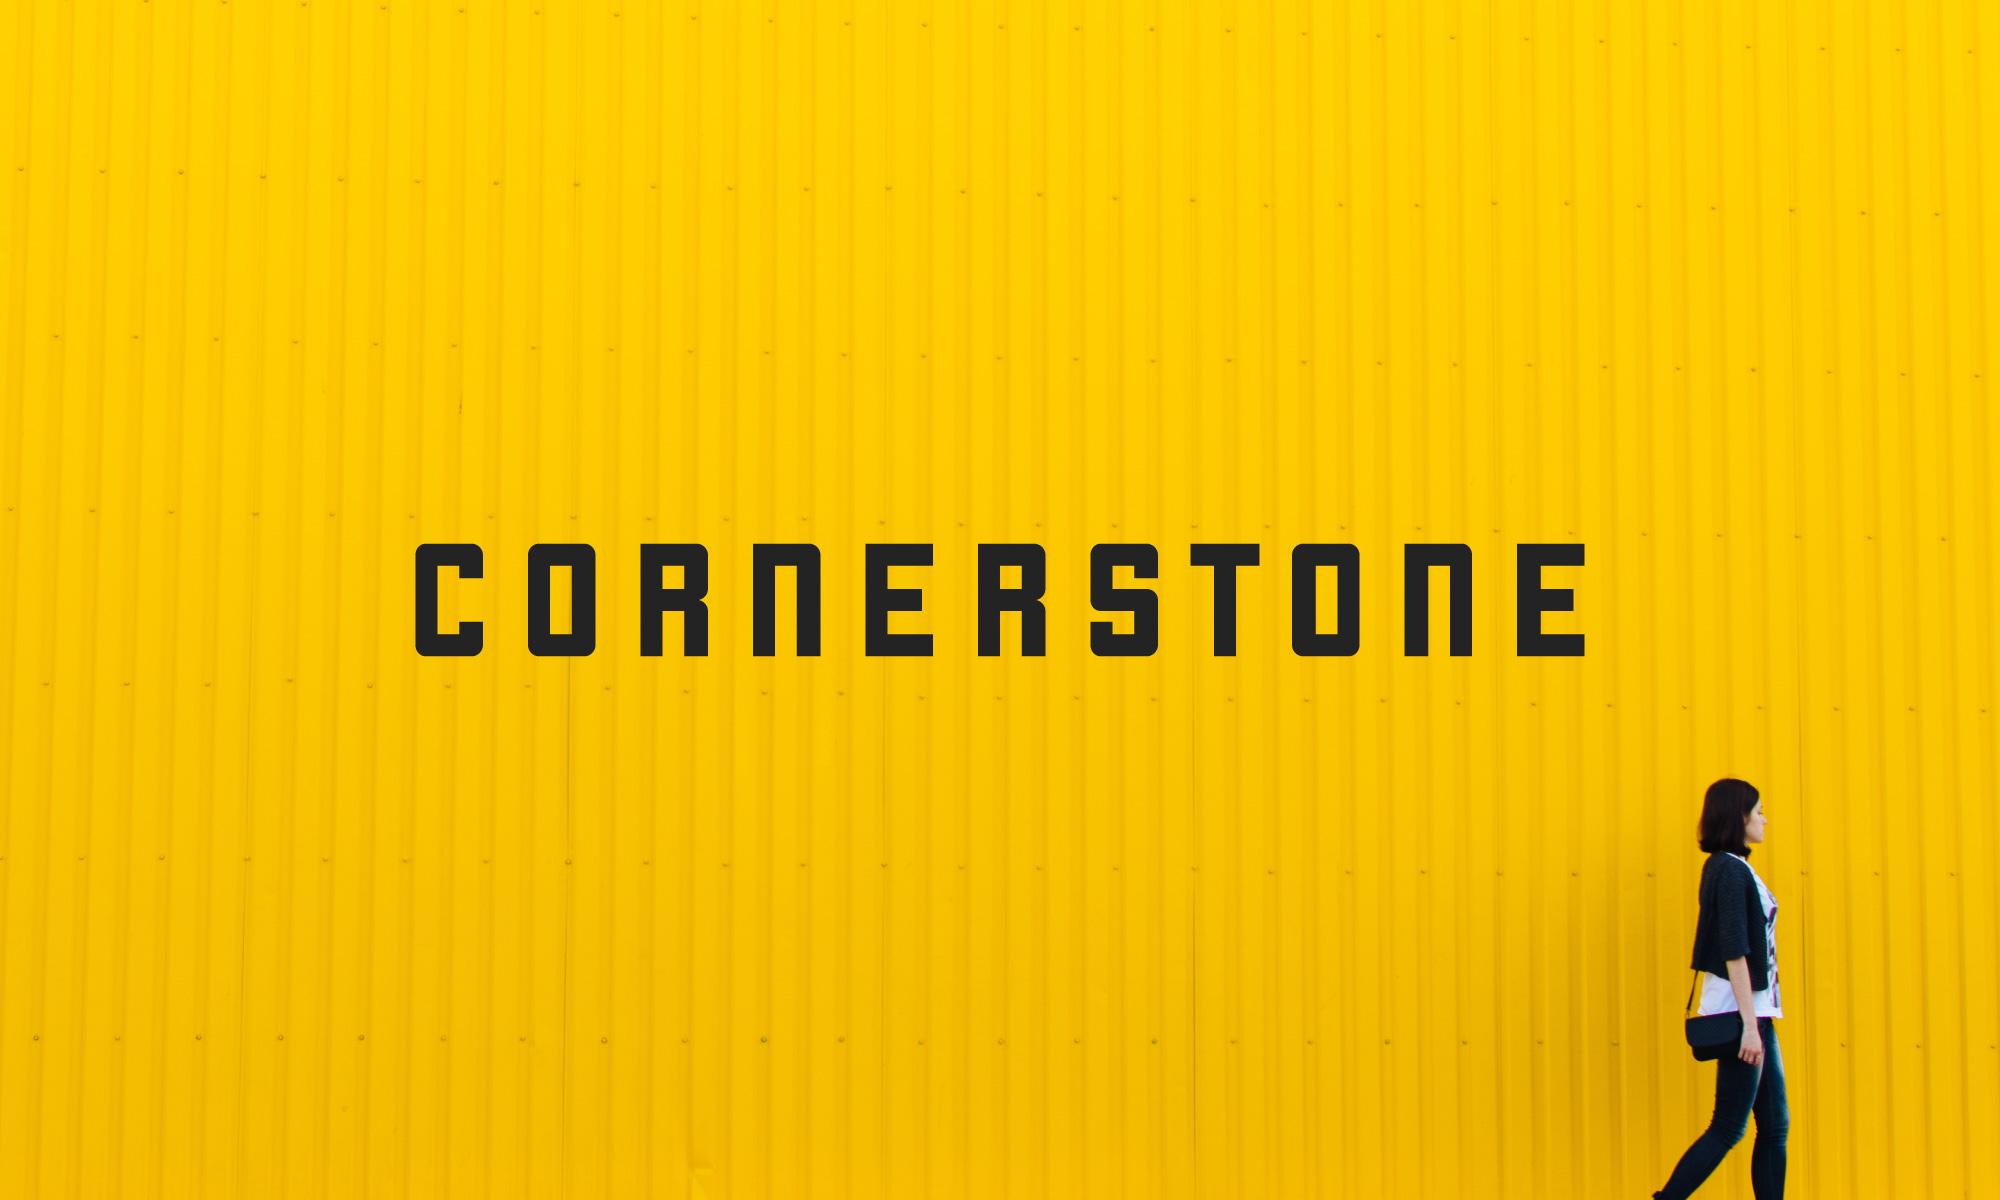 Cornerstone-Gallery-1